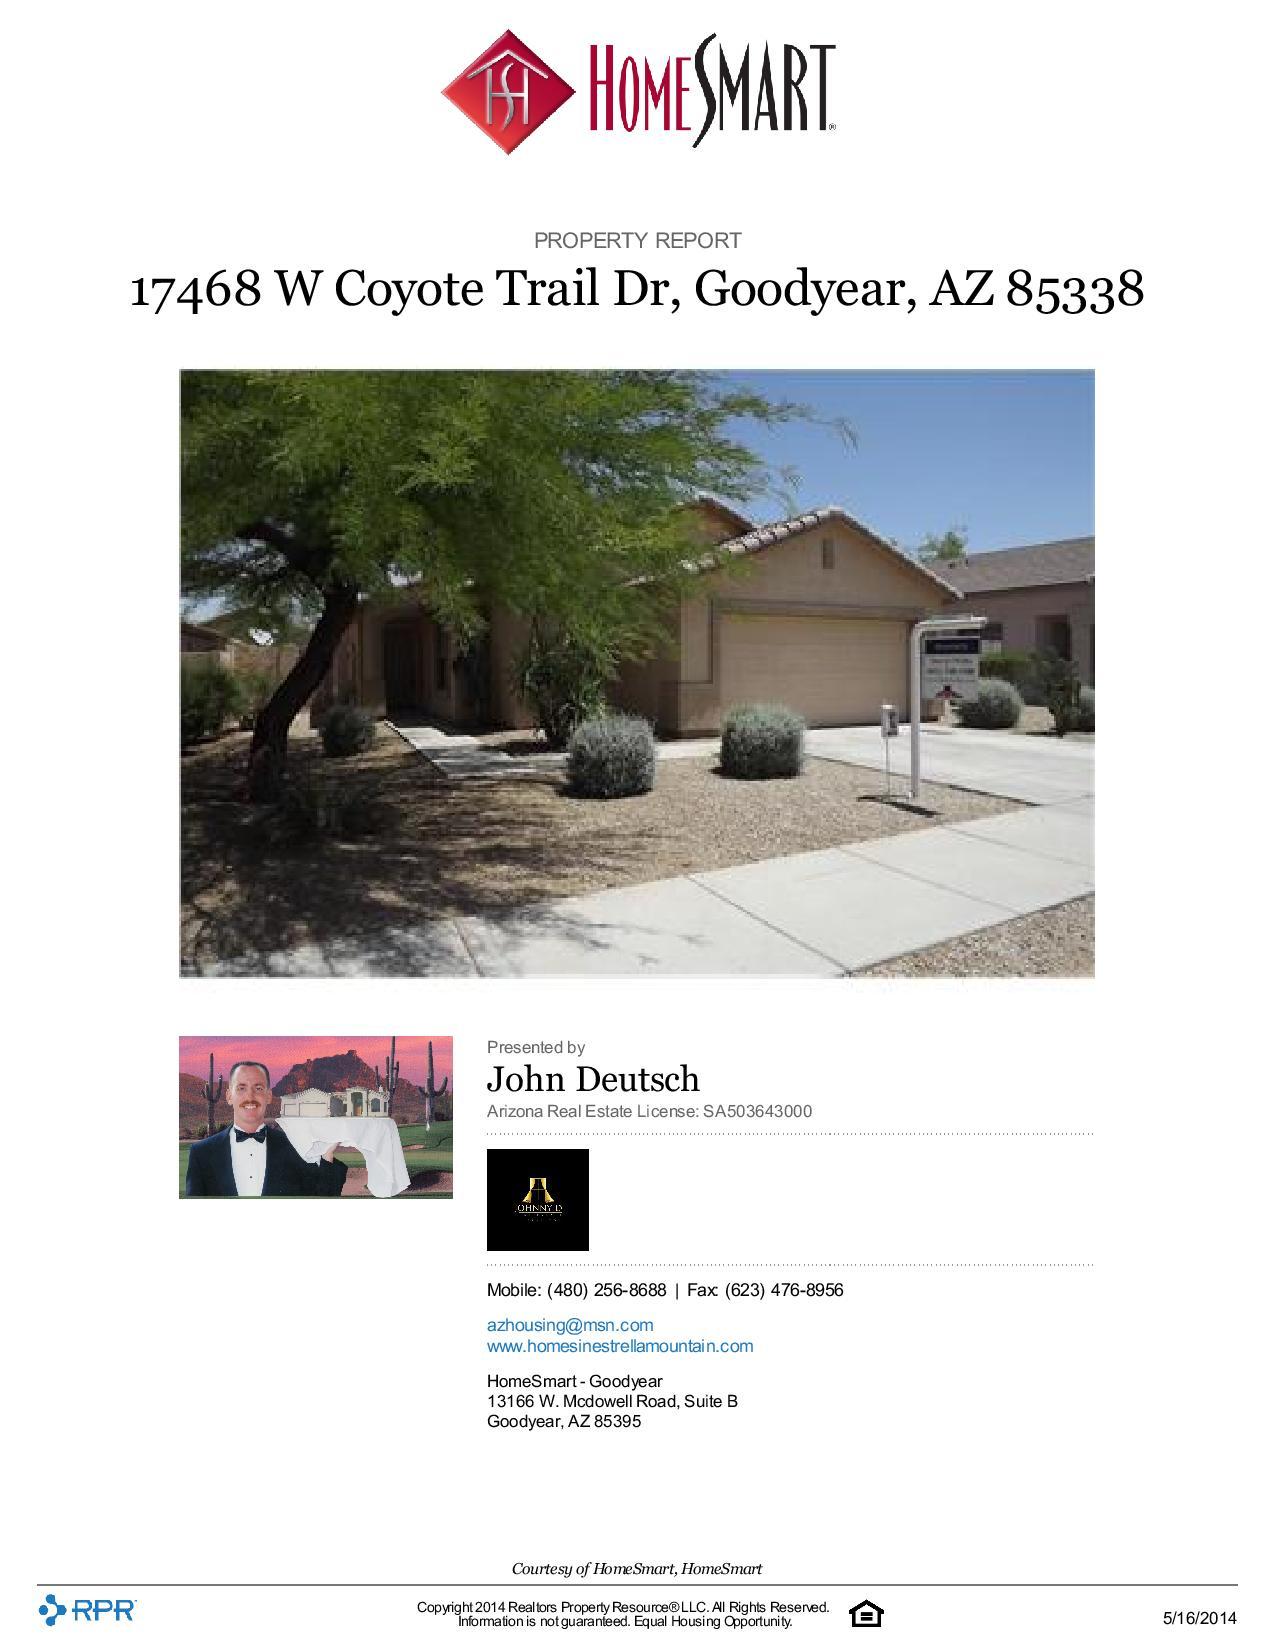 17468-W-Coyote-Trail-Dr-Goodyear-AZ-85338-page-001